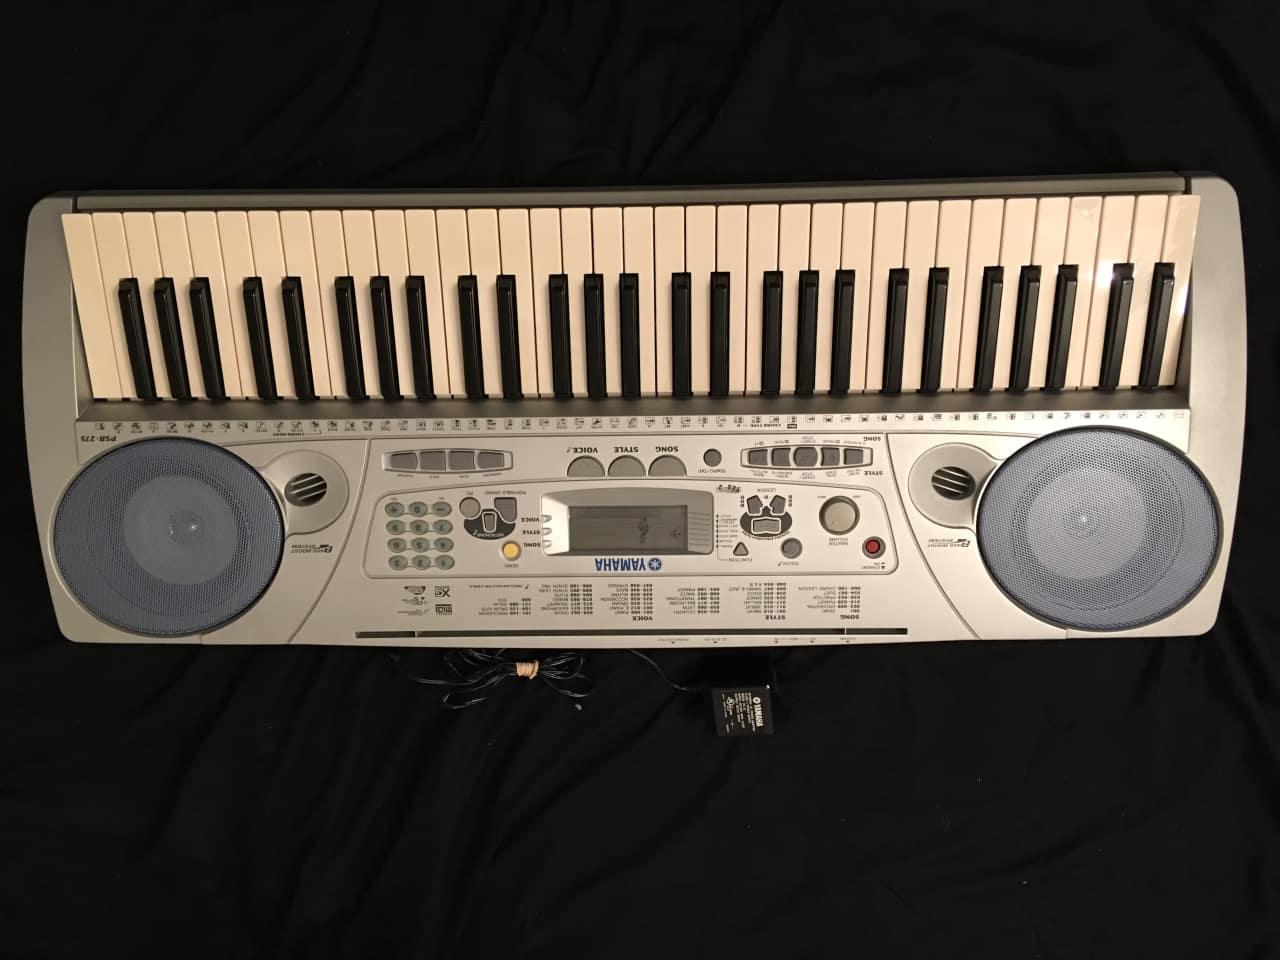 Yamaha portatone electronic keyboard psr 275 midi for Yamaha portatone keyboard